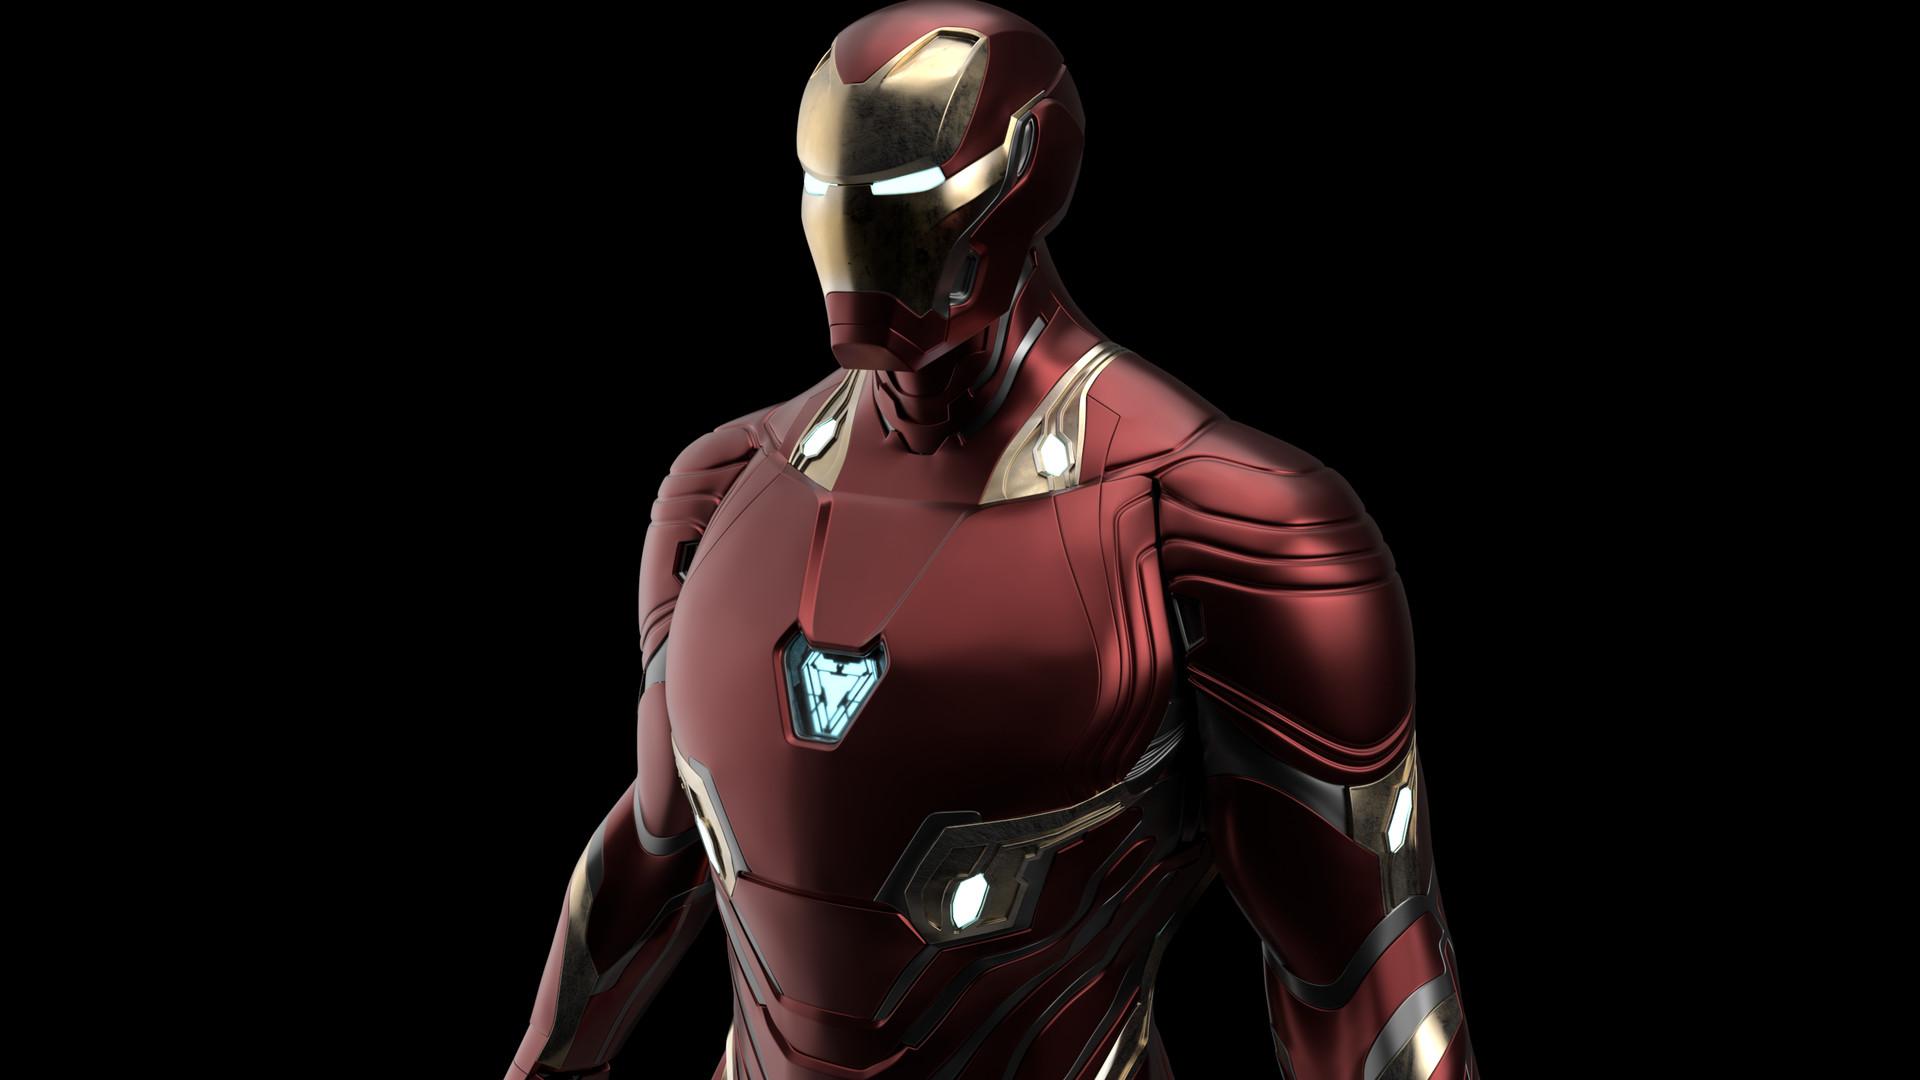 Emilio Lv Iron Man Mark 50